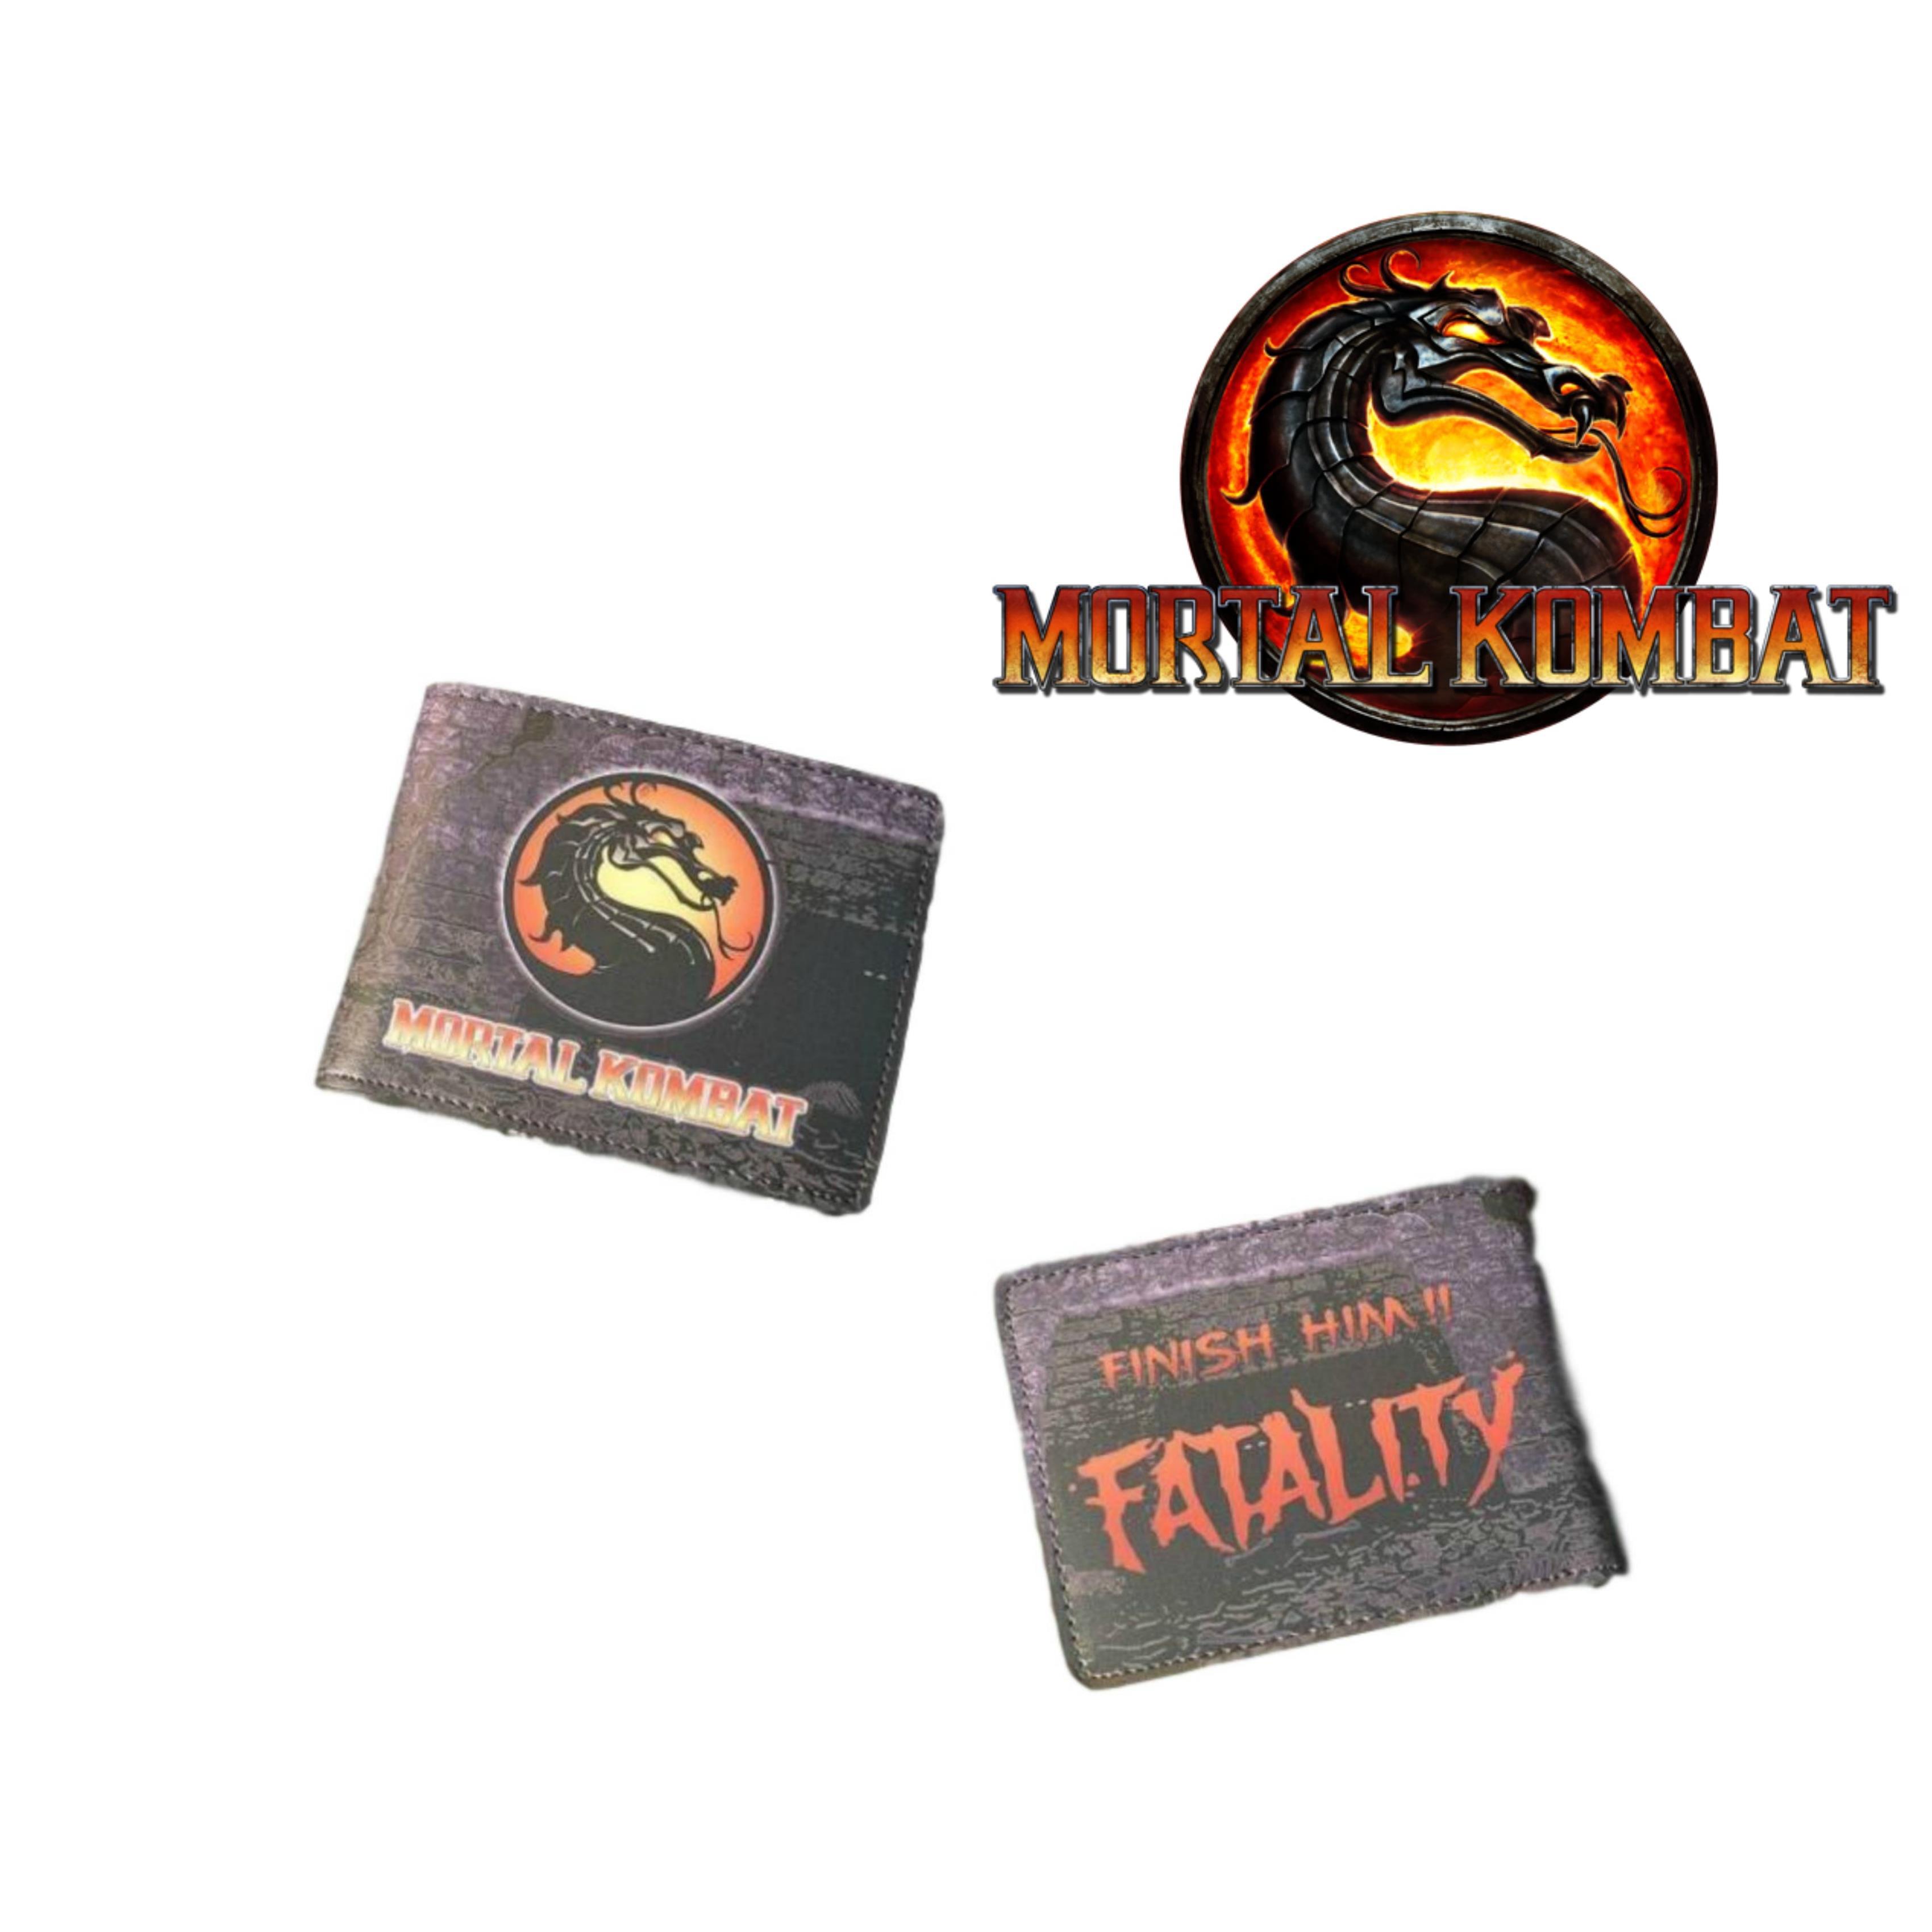 Superheroes Mortal Kombat Logo Bi-fold Mens Boys Wallet with Gift Box